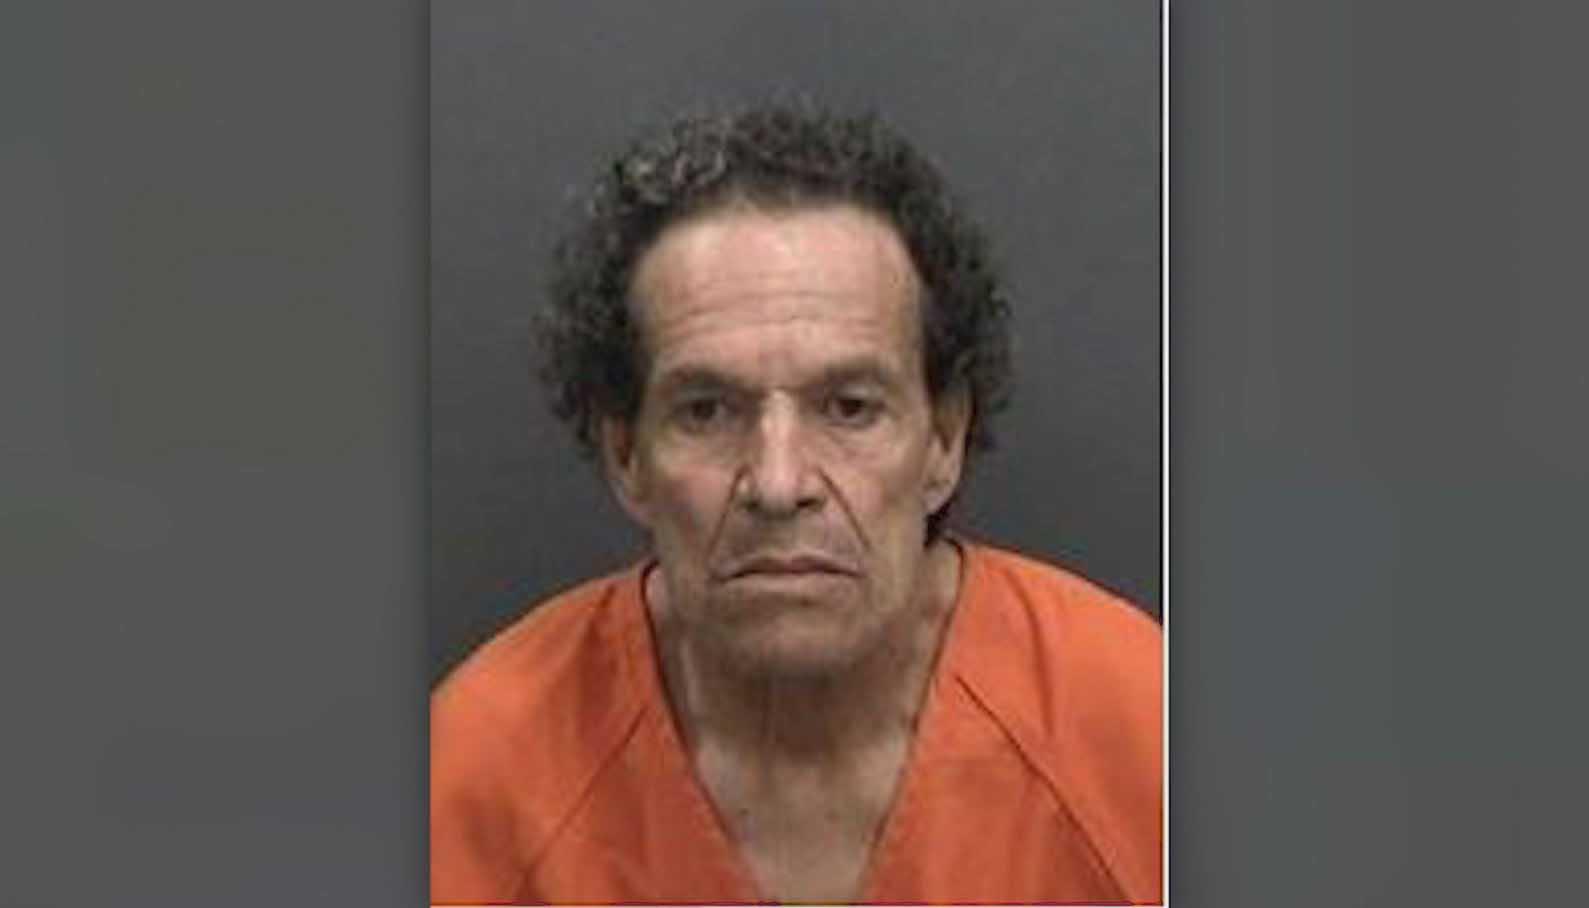 Vidal Estrada (Source: Hillsborough County Sheriff's Office/CNN)